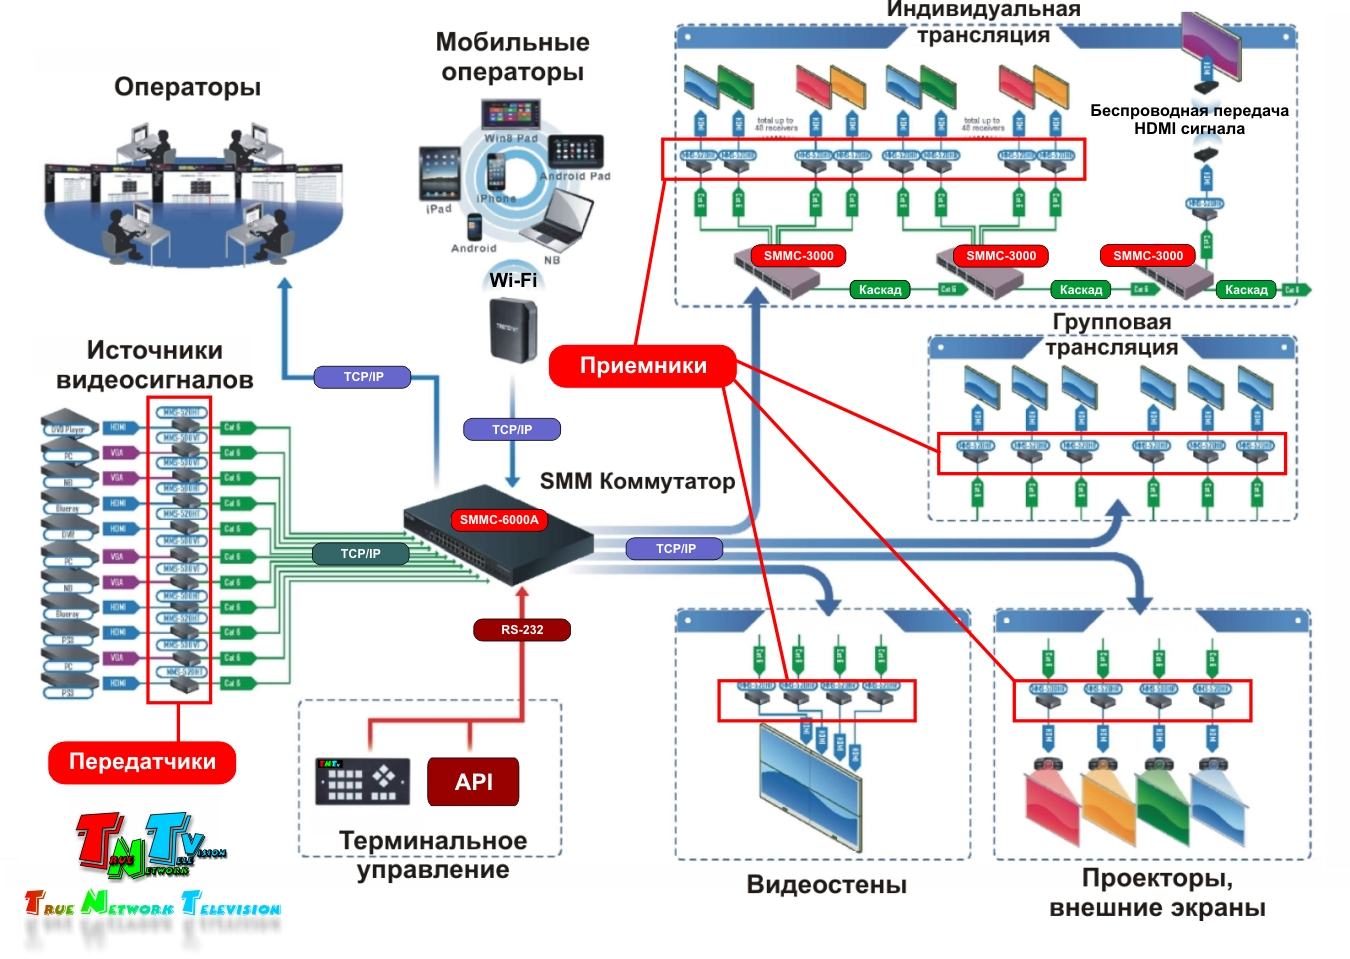 Схема коммутации сети